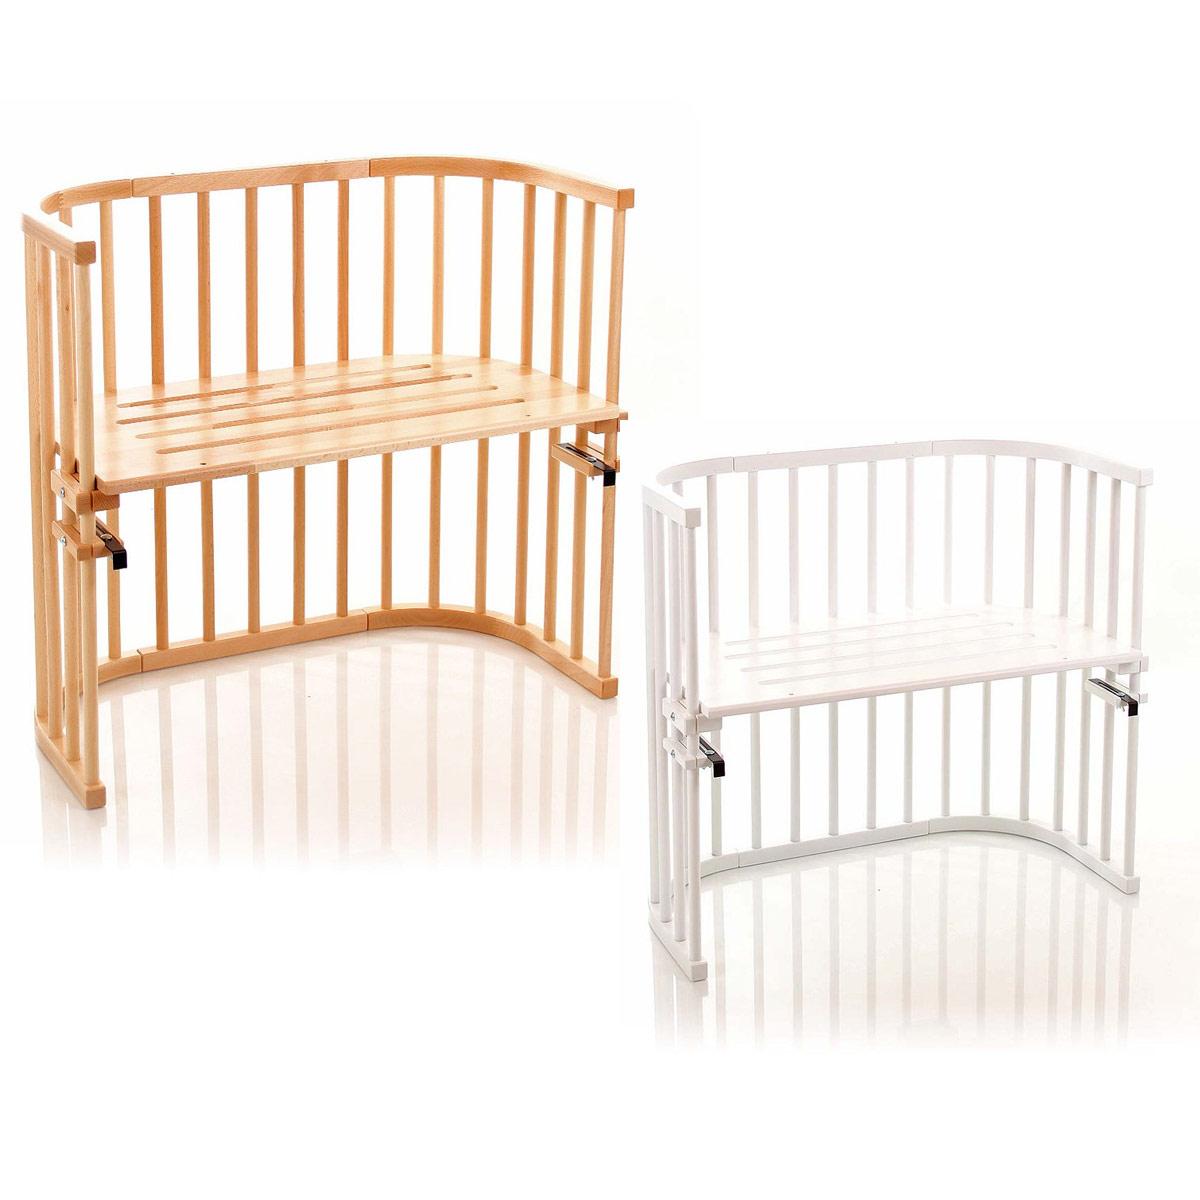 Tobi Babybay Original Nursing Bed Crib Lying Surface Extra Ventilated